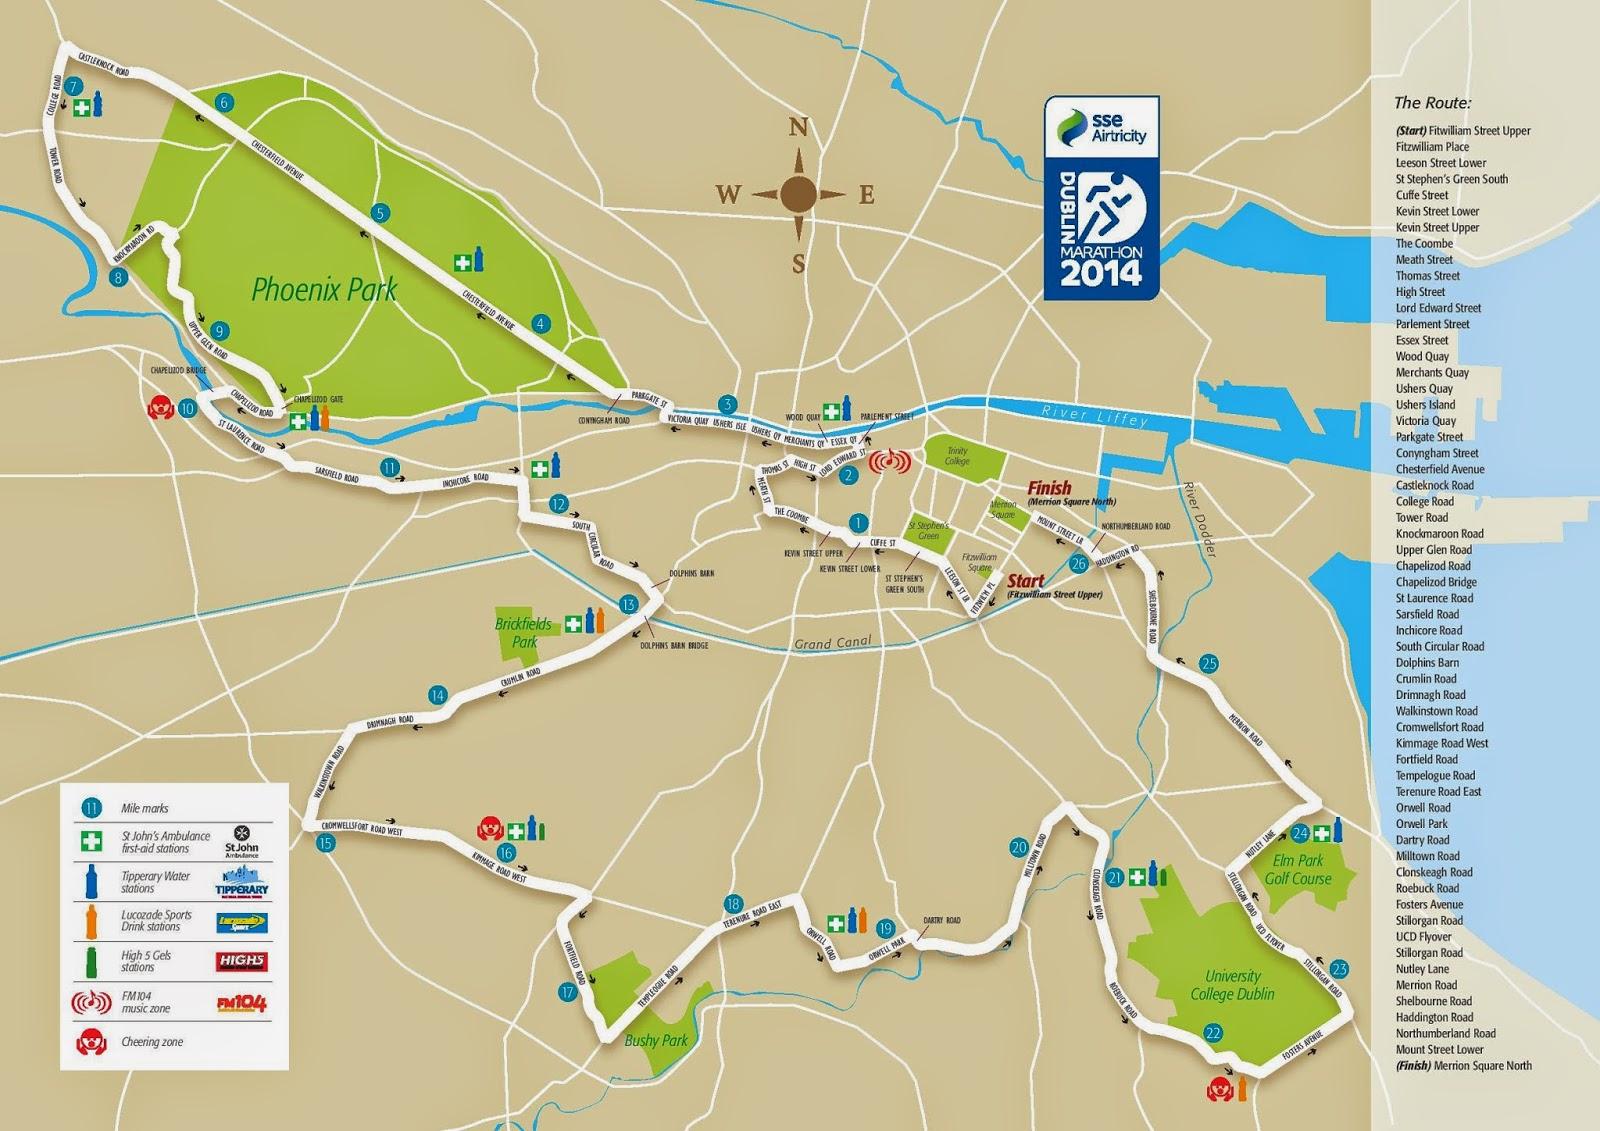 Dublin Marathon Map